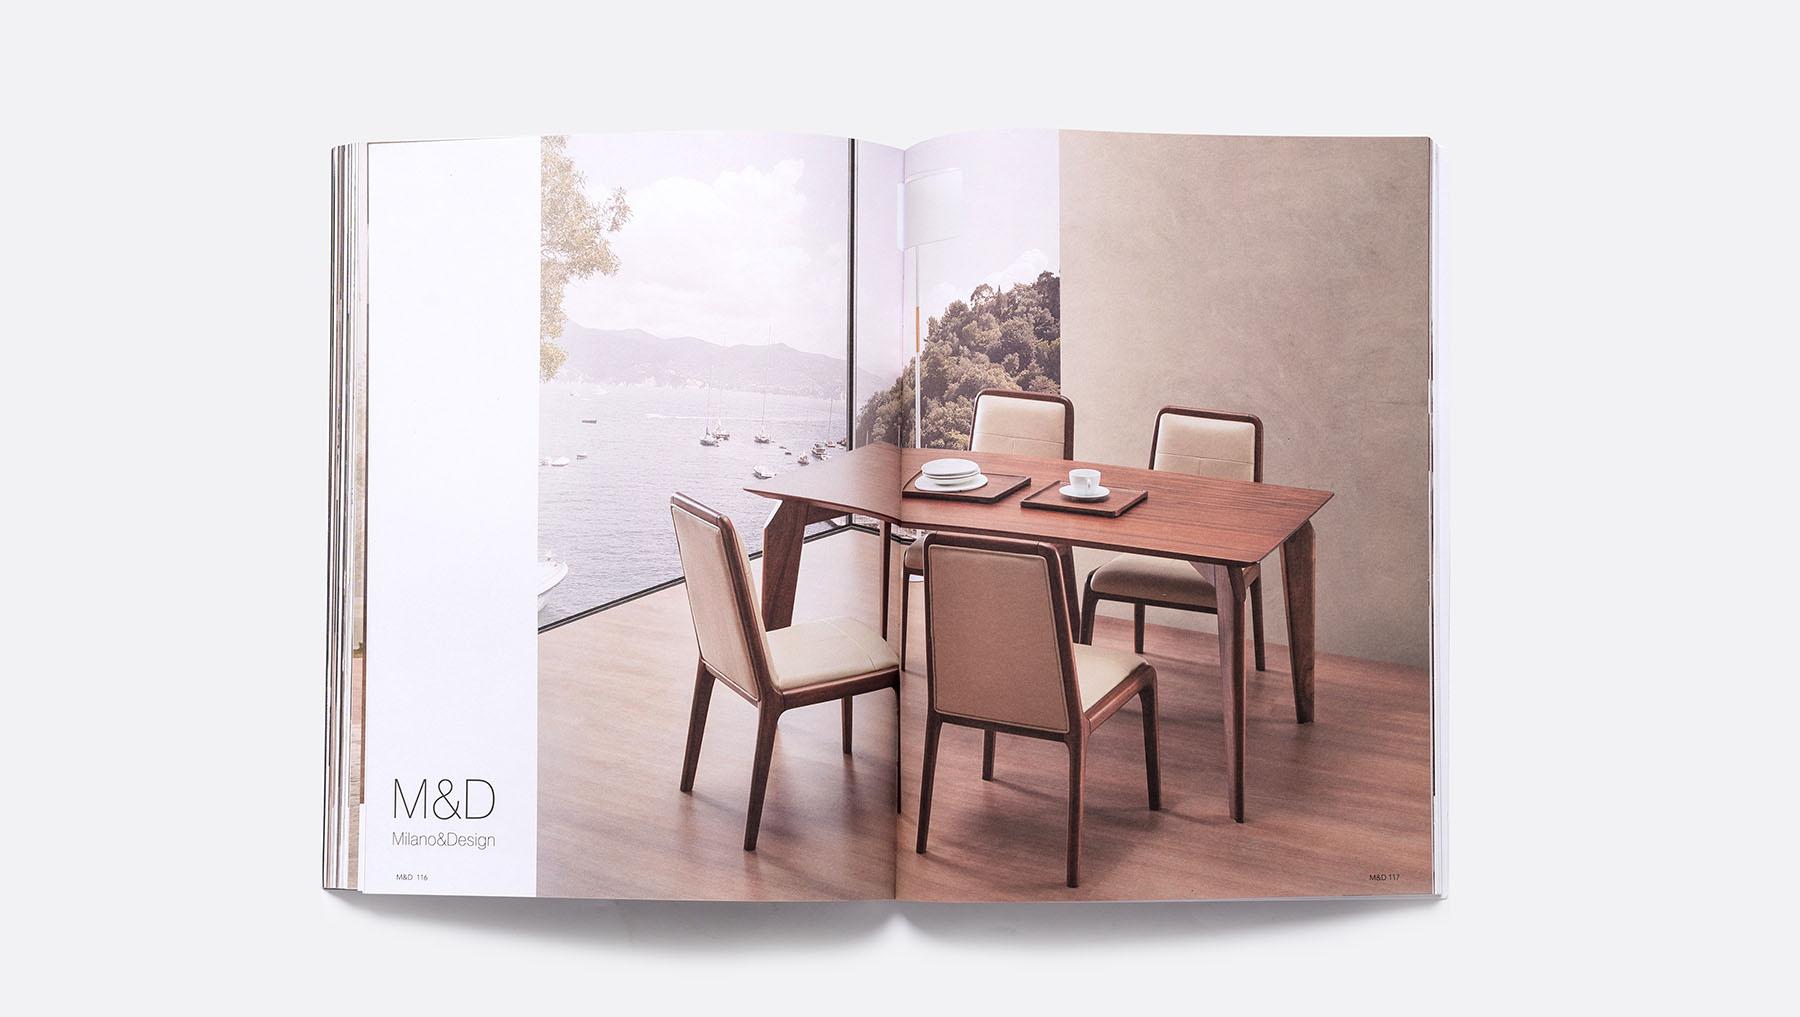 米兰MD品牌设计